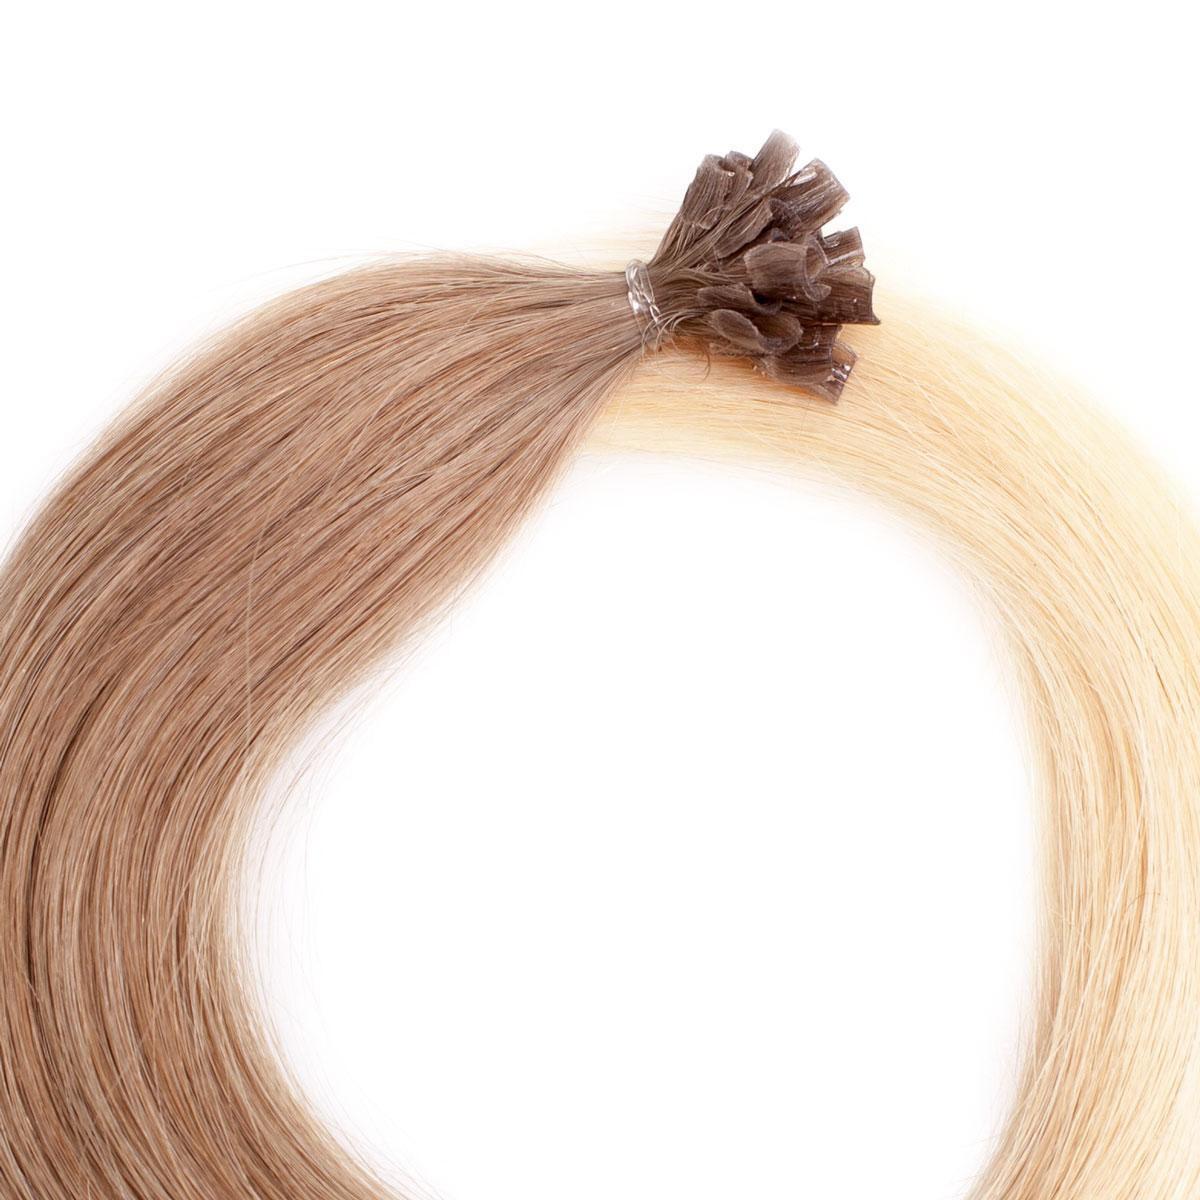 Nail Hair Original O7.3/10.8 Cendre Ash Blond Ombre 60 cm